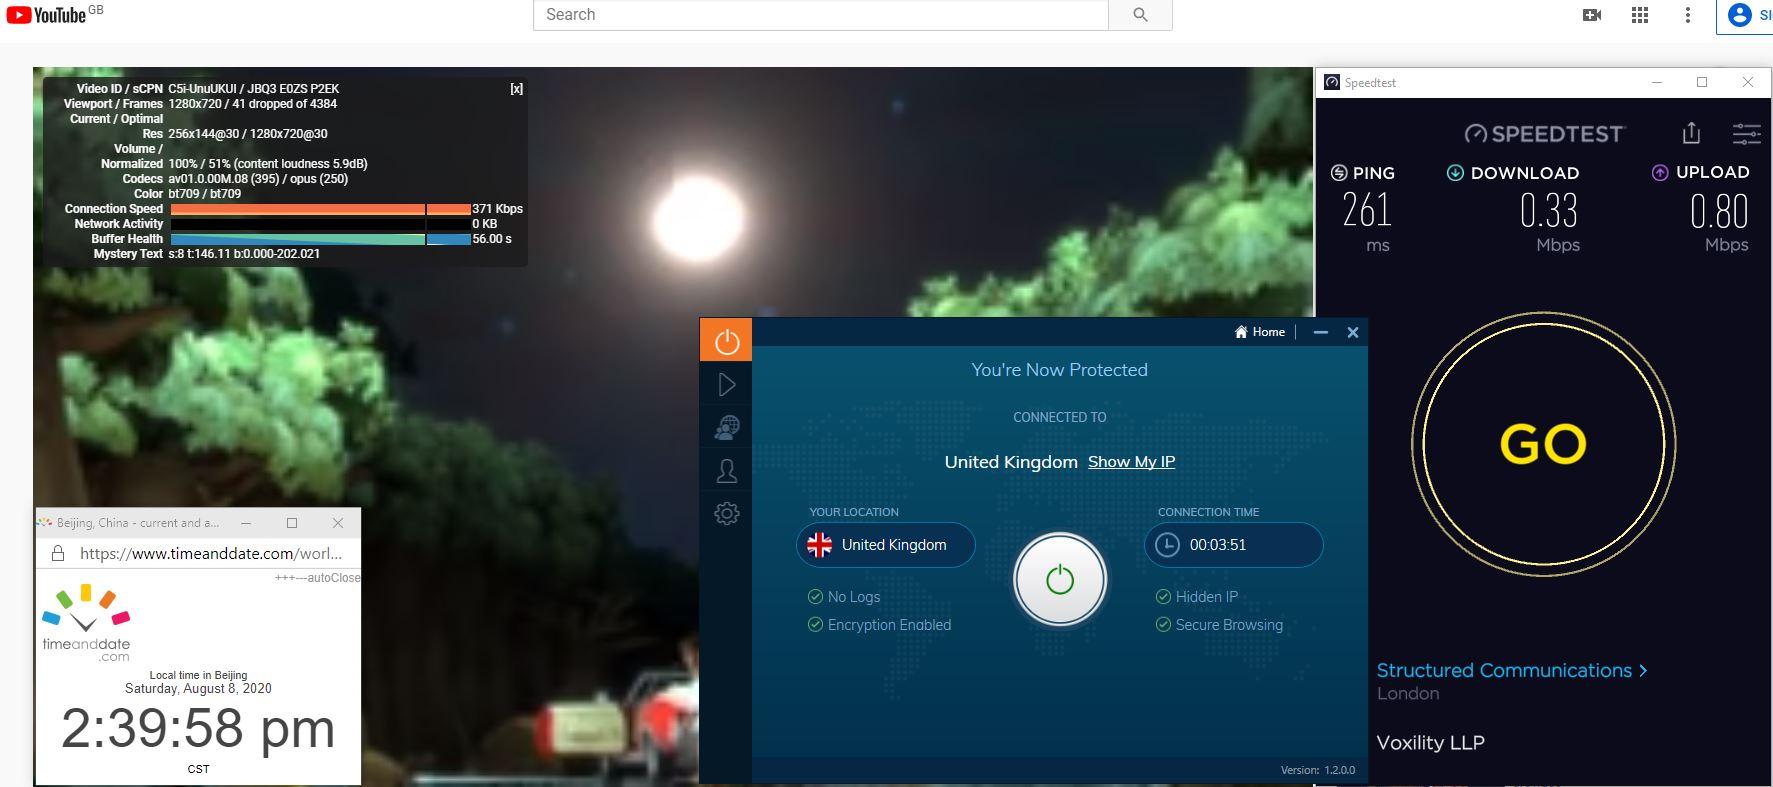 Windows10 IvacyVPN-Prime版本 UK 中国VPN 翻墙 科学上网 翻墙速度测试 - 20200808